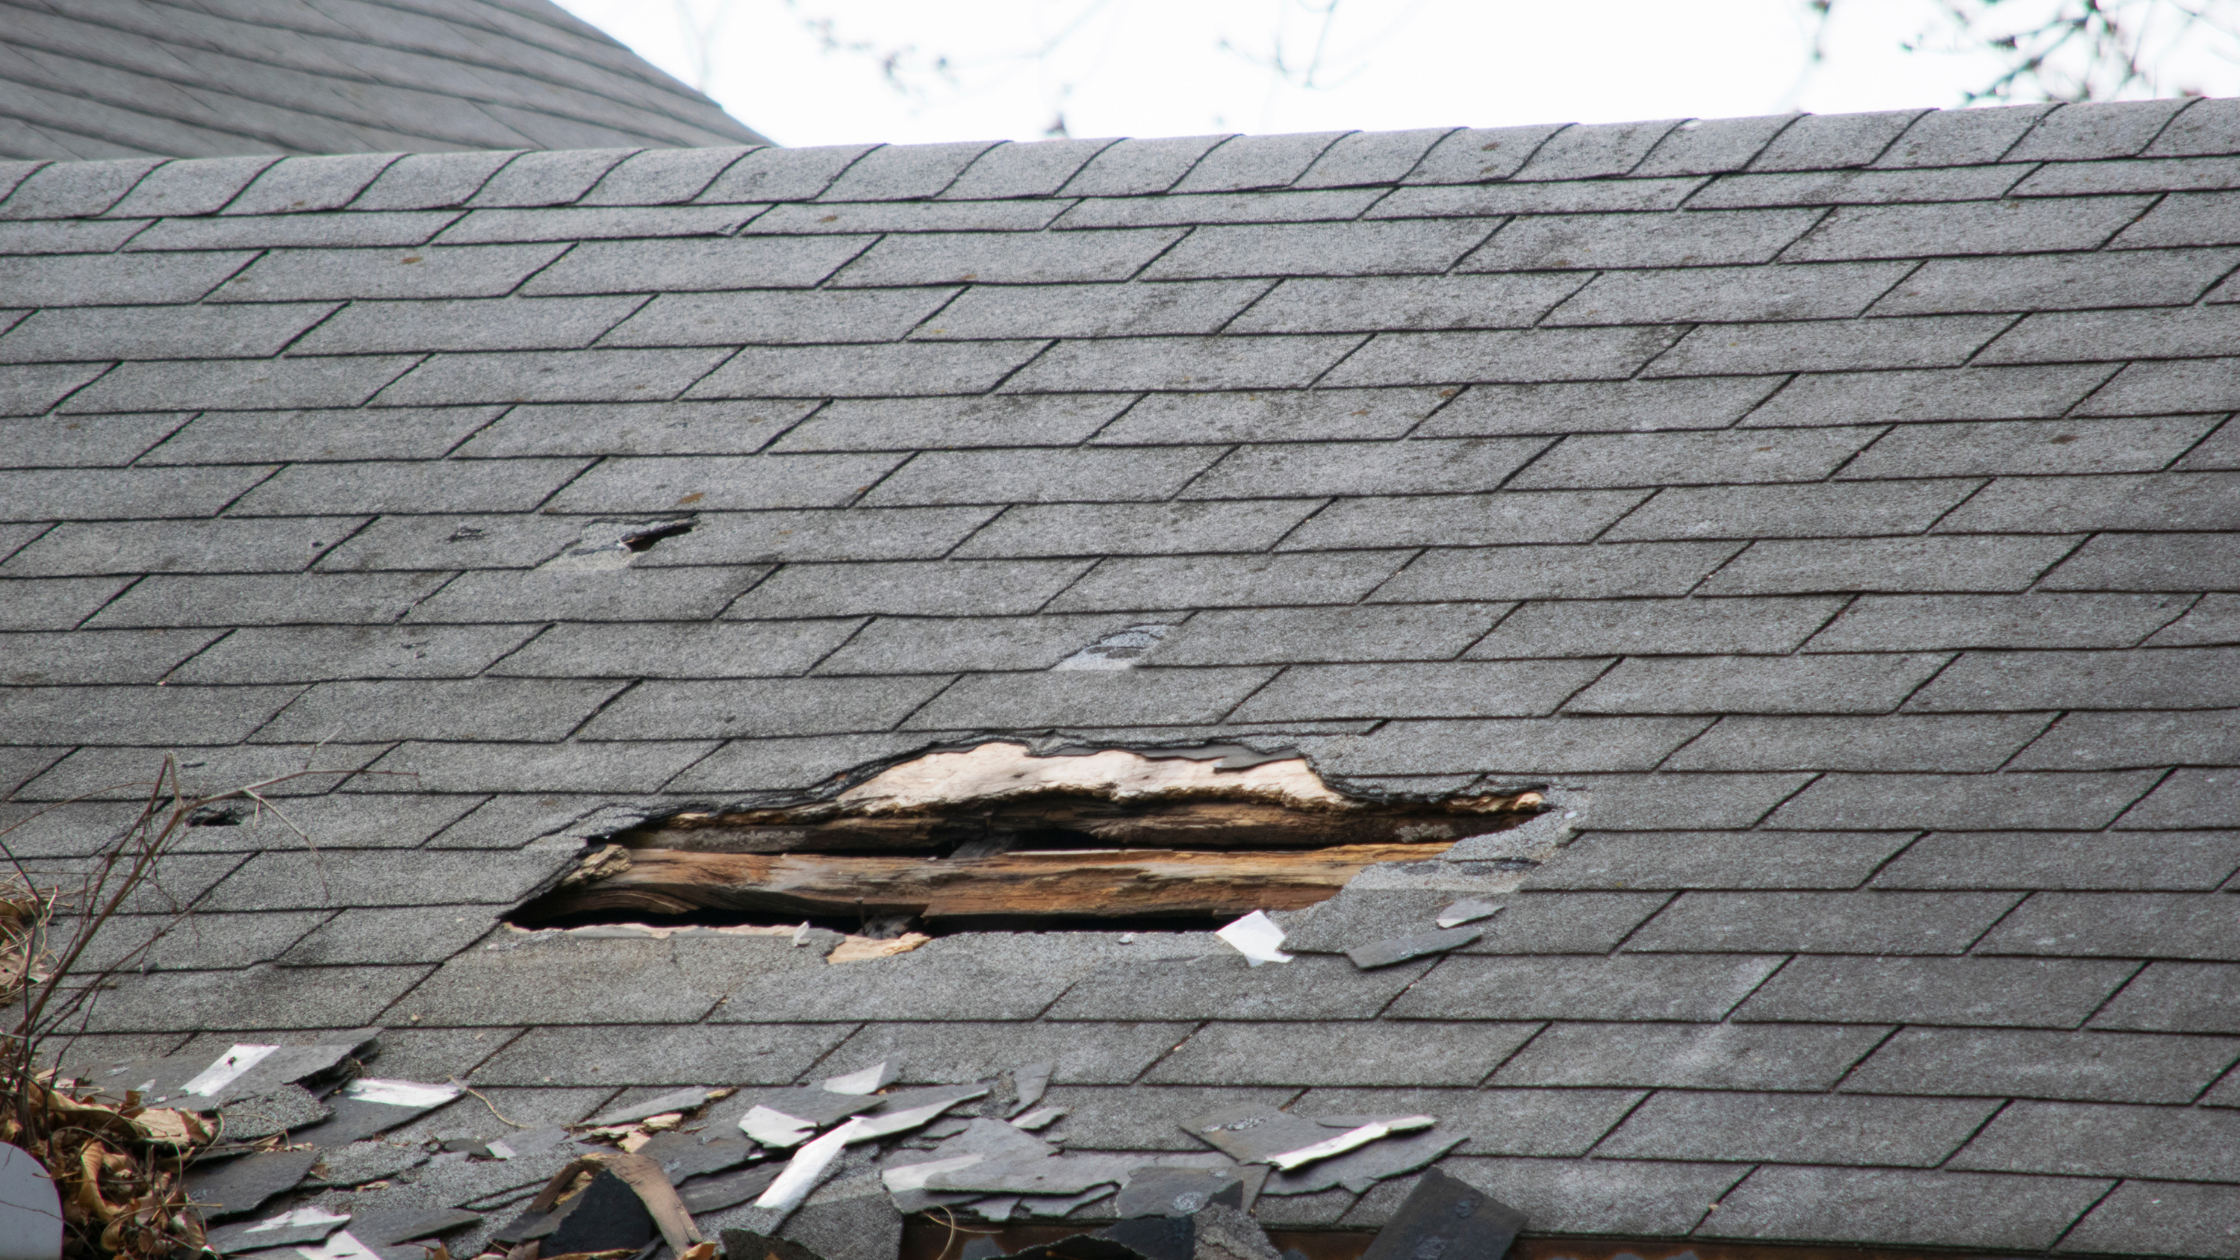 roof leak damage insurance claims public adjuster warwick, ri